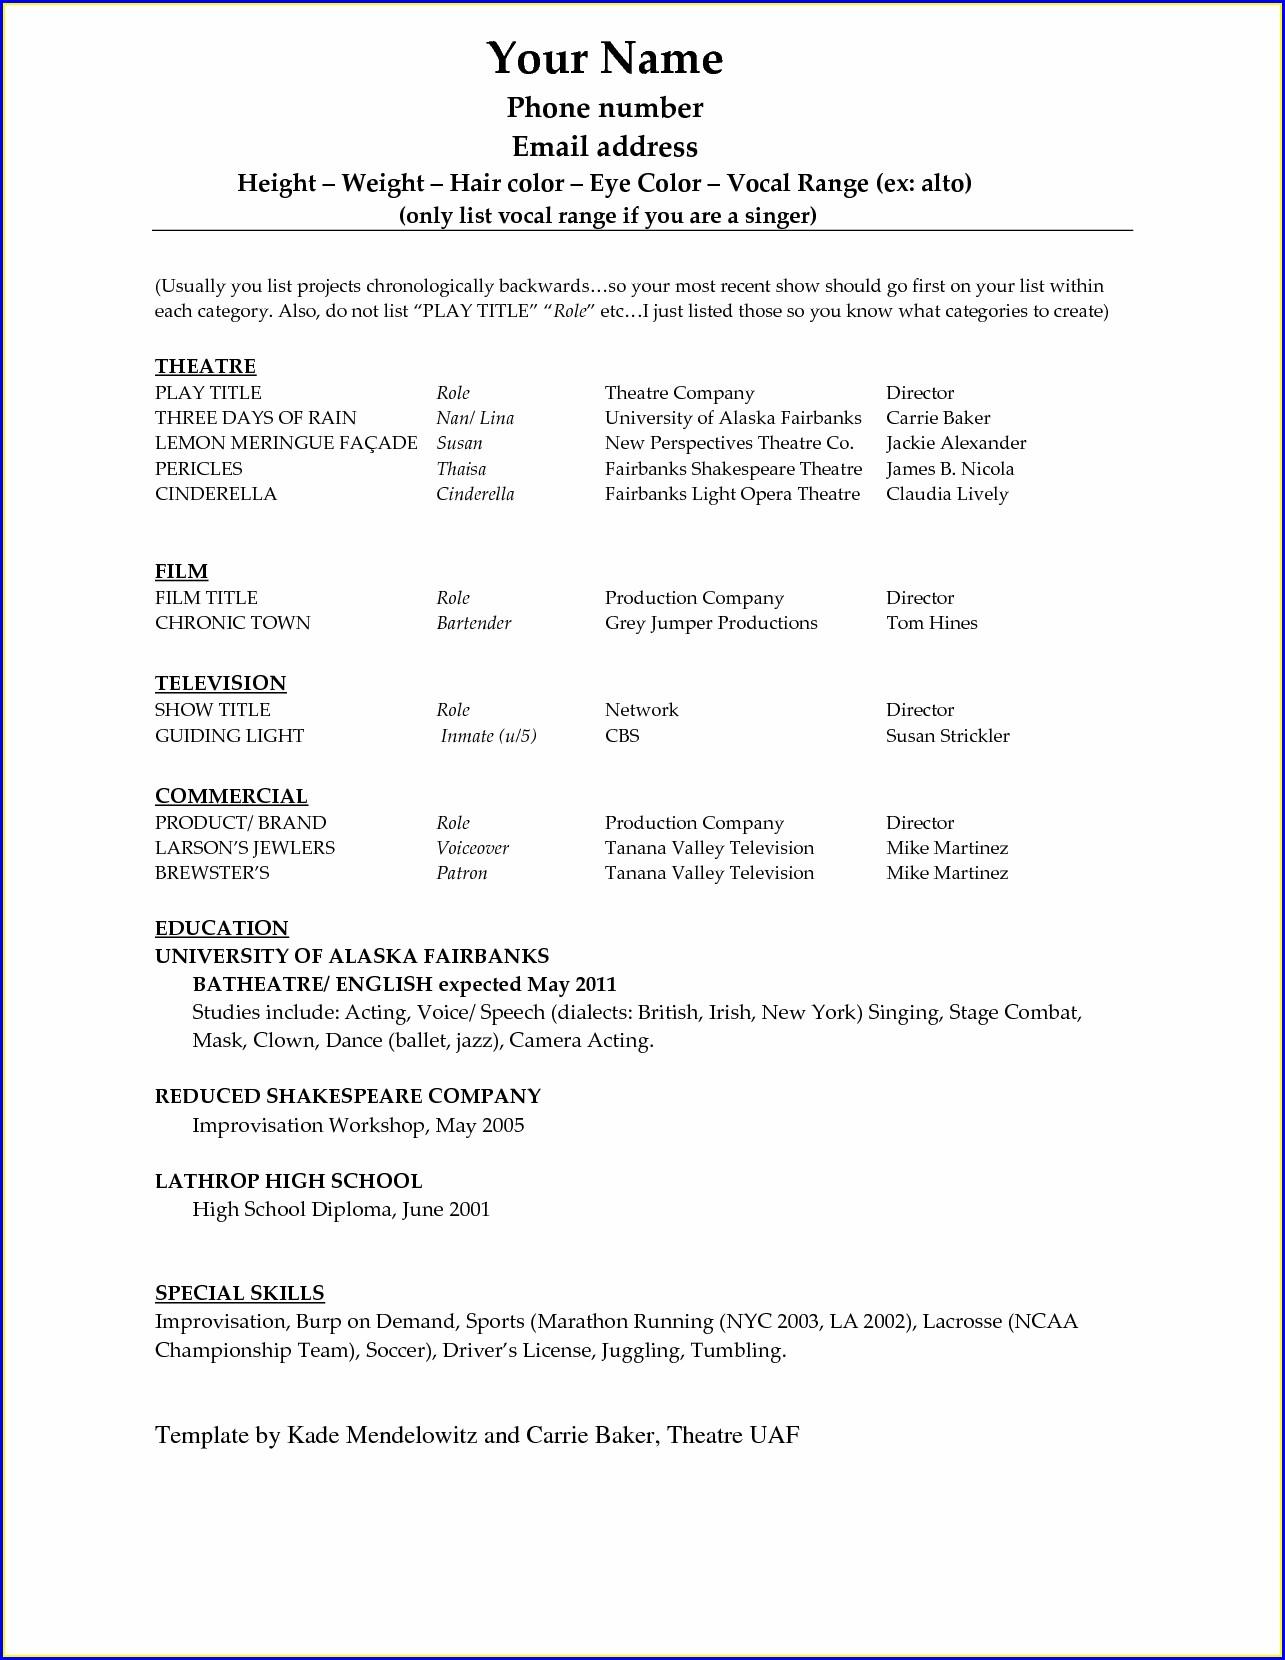 Resume Template Microsoft Word 2010